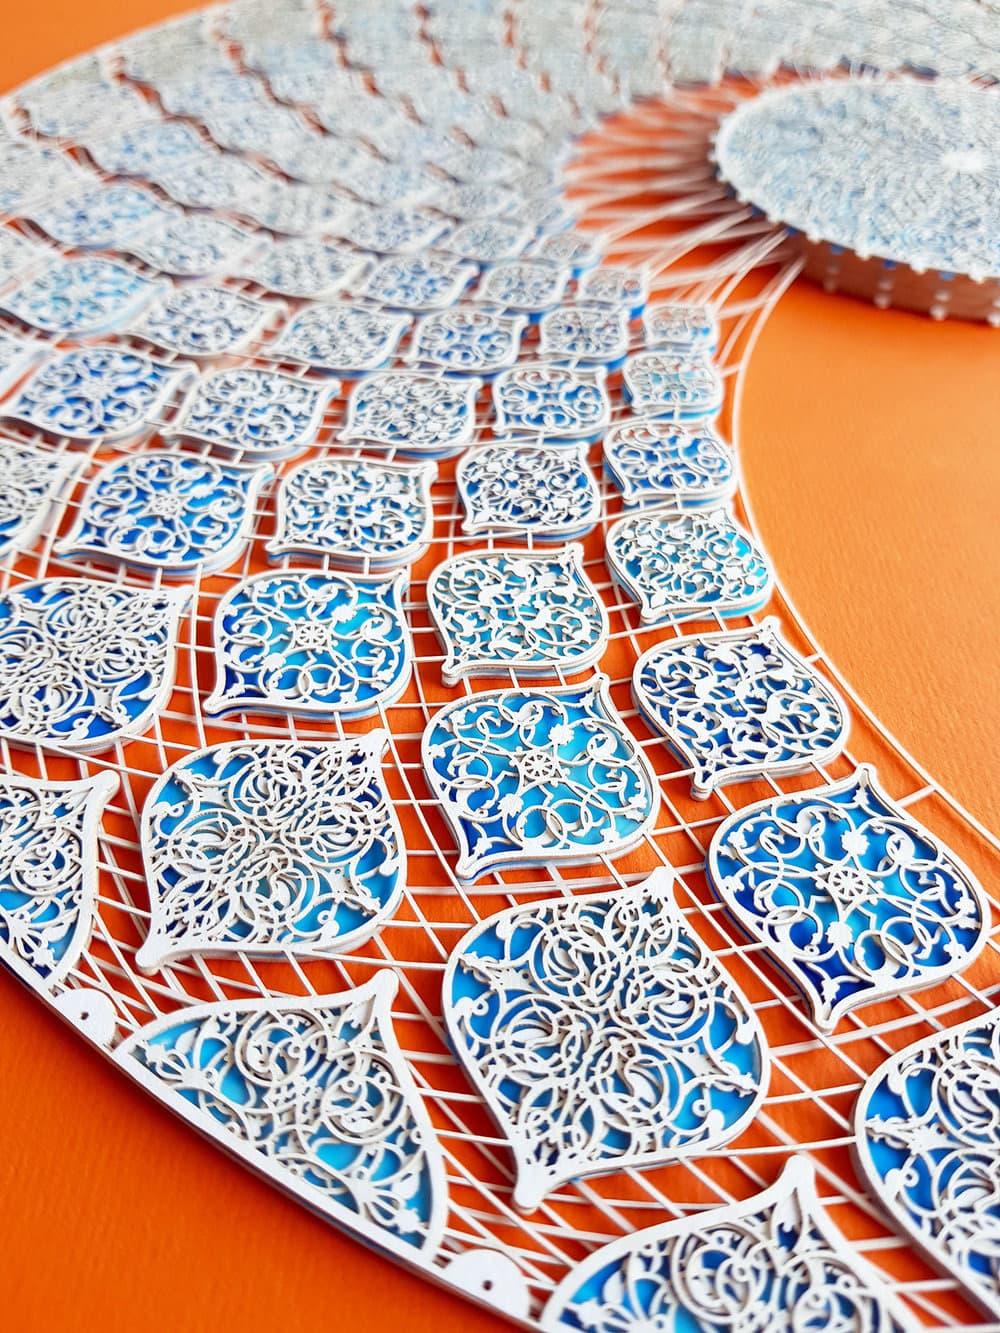 Julia Ibbini - Ornamente aus Papier